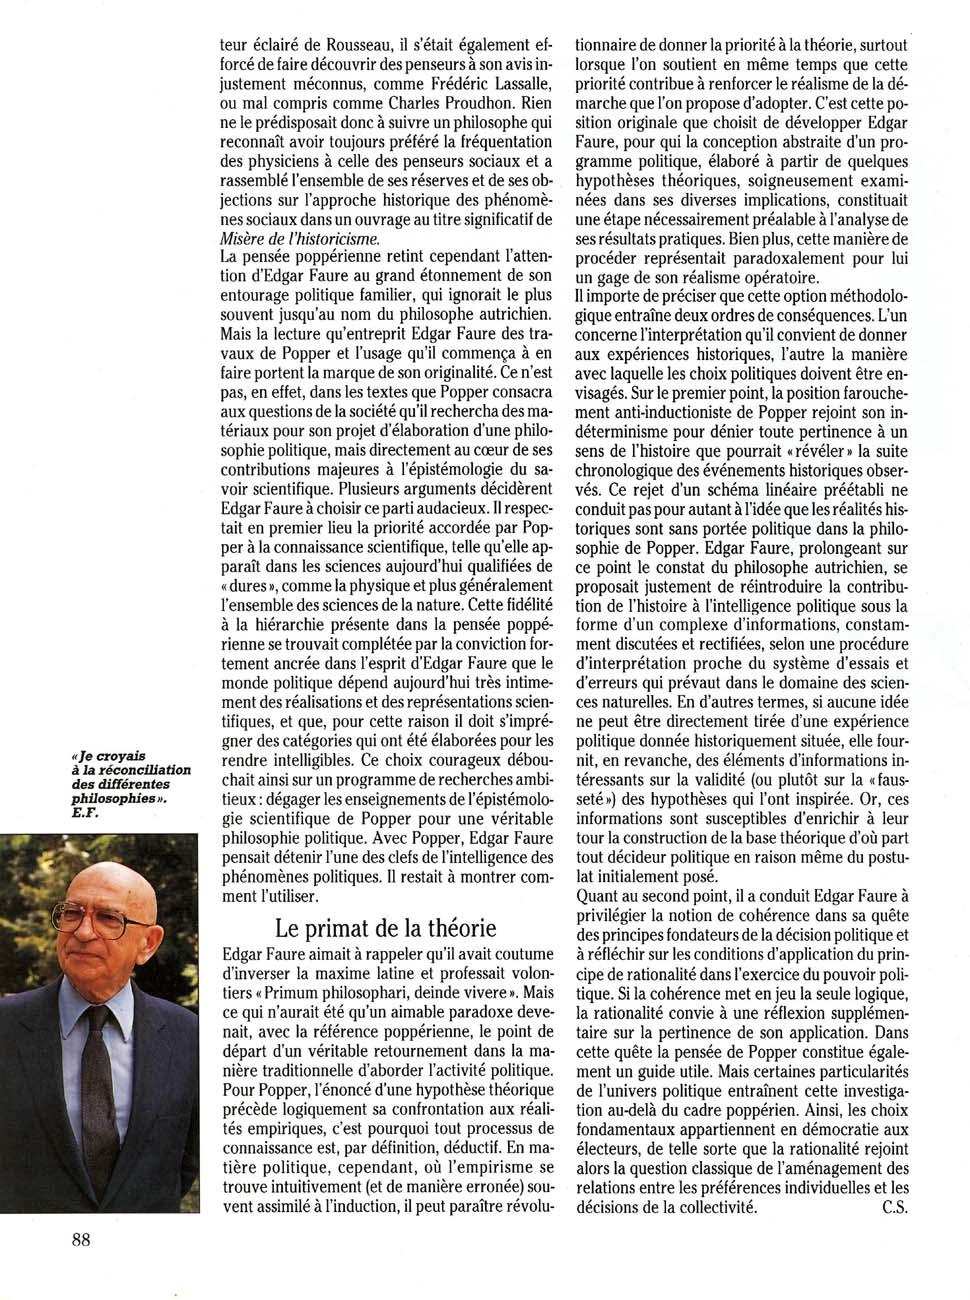 Juste et loin (Valéry Giscard D'Estaing)